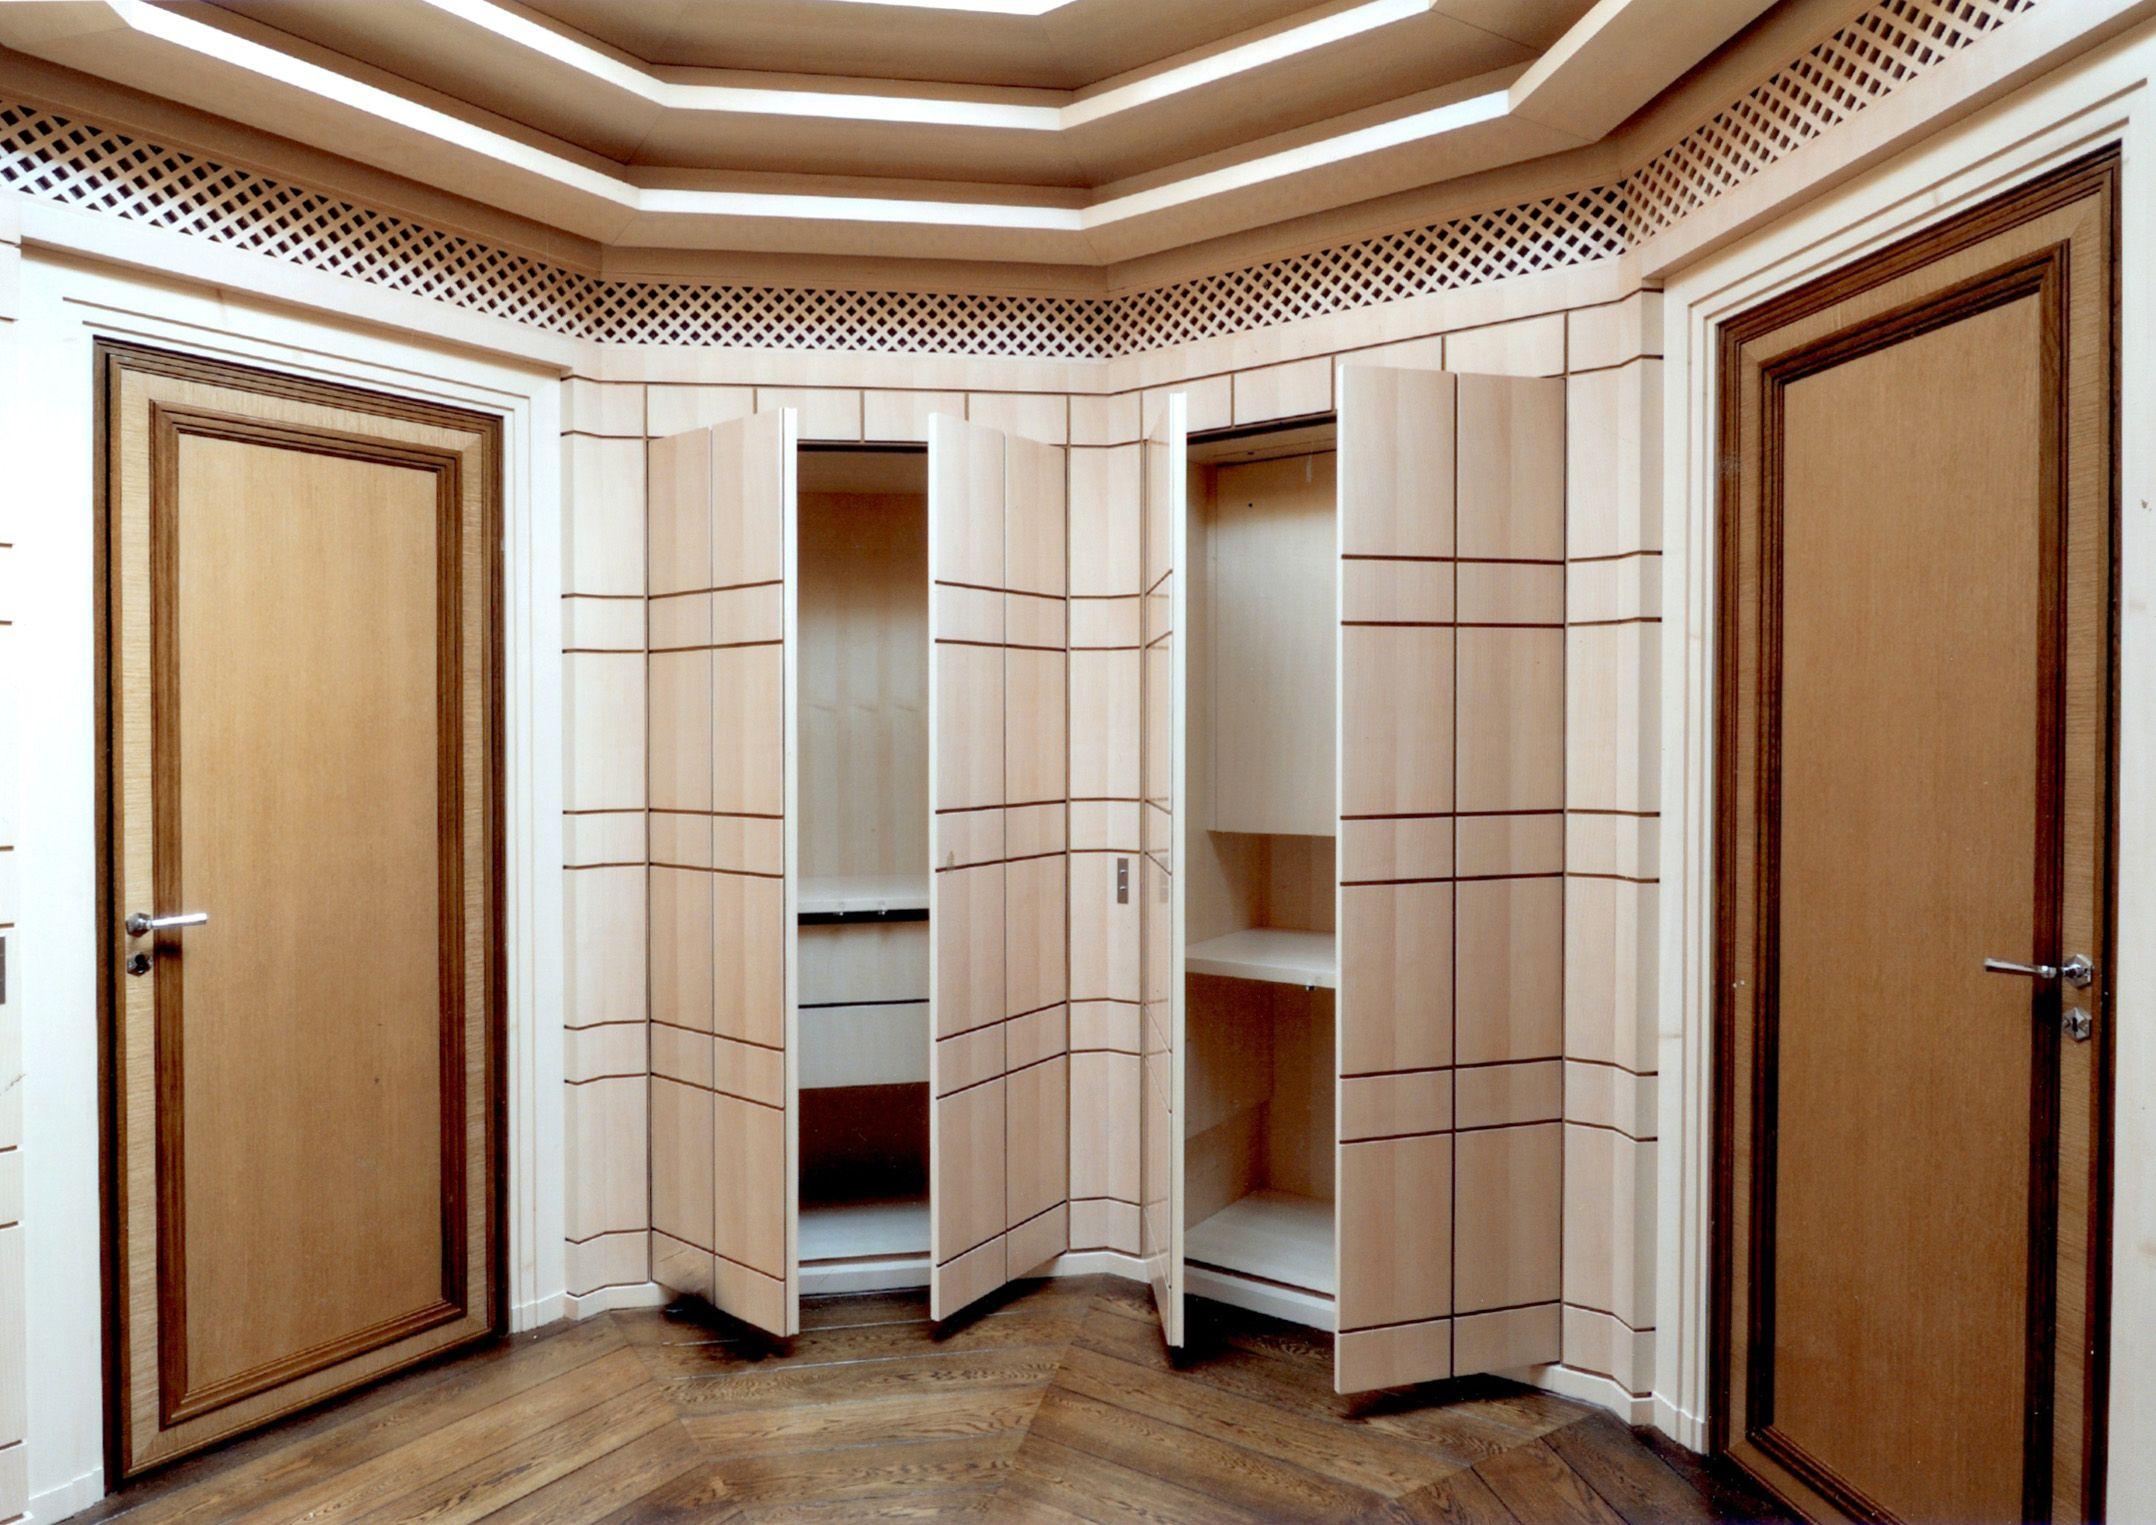 Master Bedroom Kitchenette after octagonal hall. master bedroom hallway. the room was